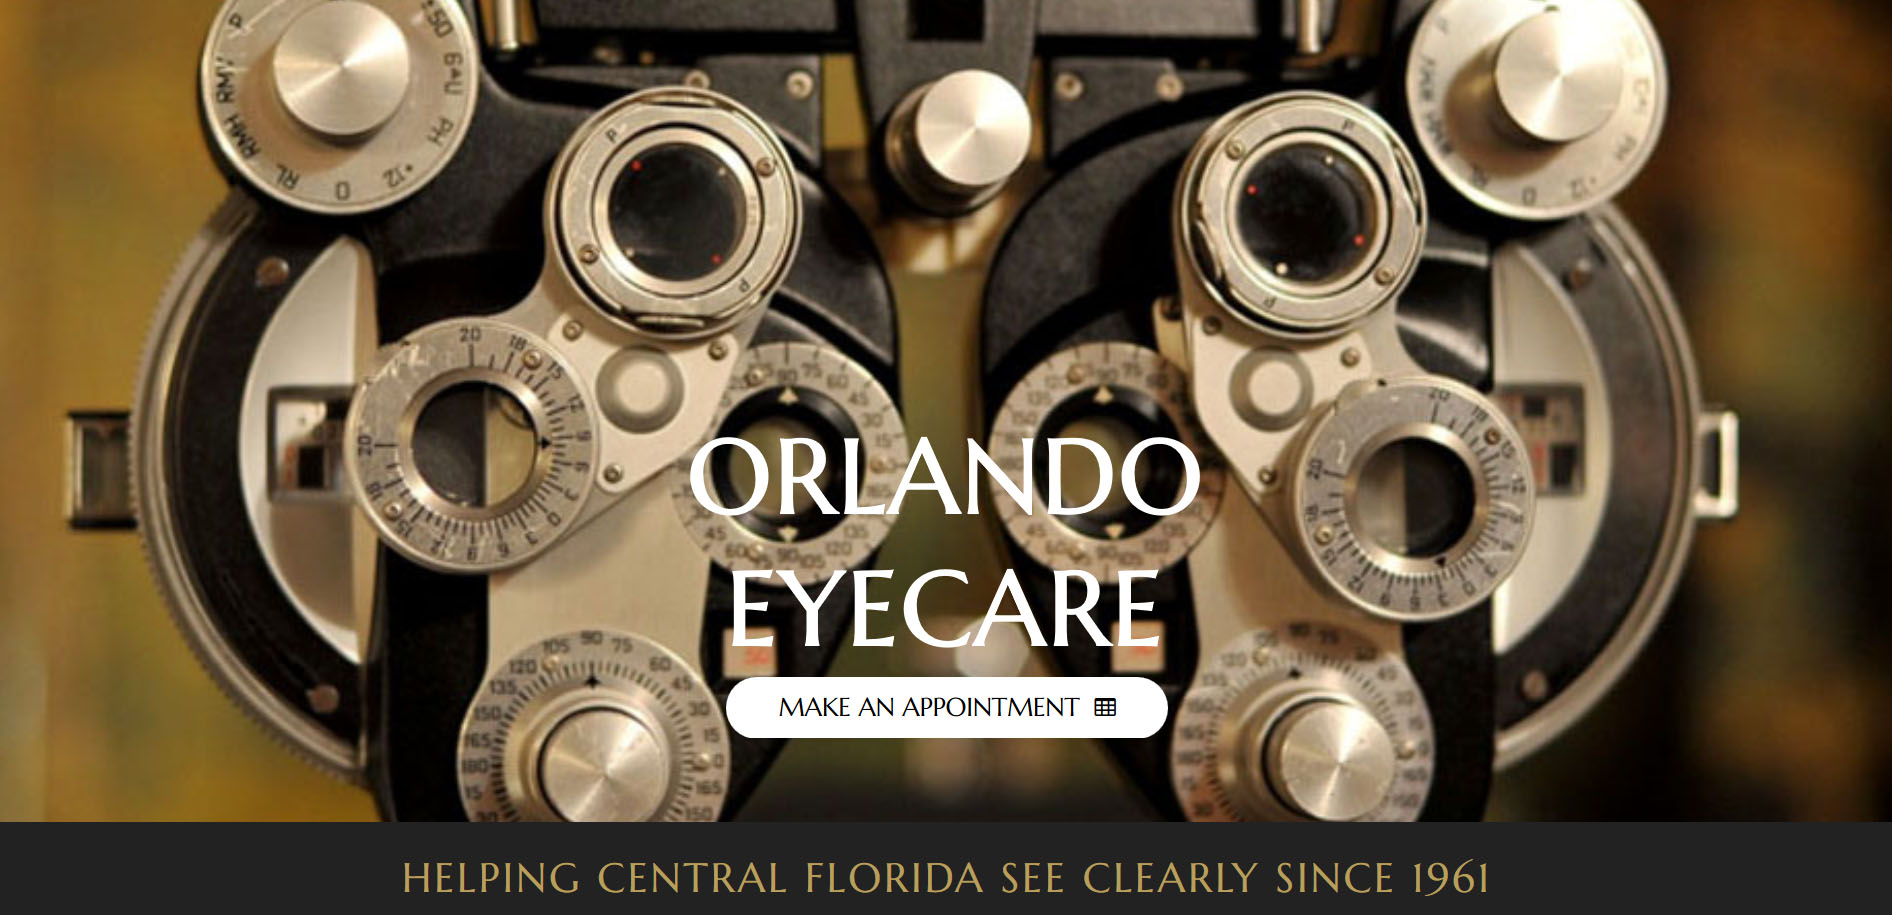 Orlando-Eyecare